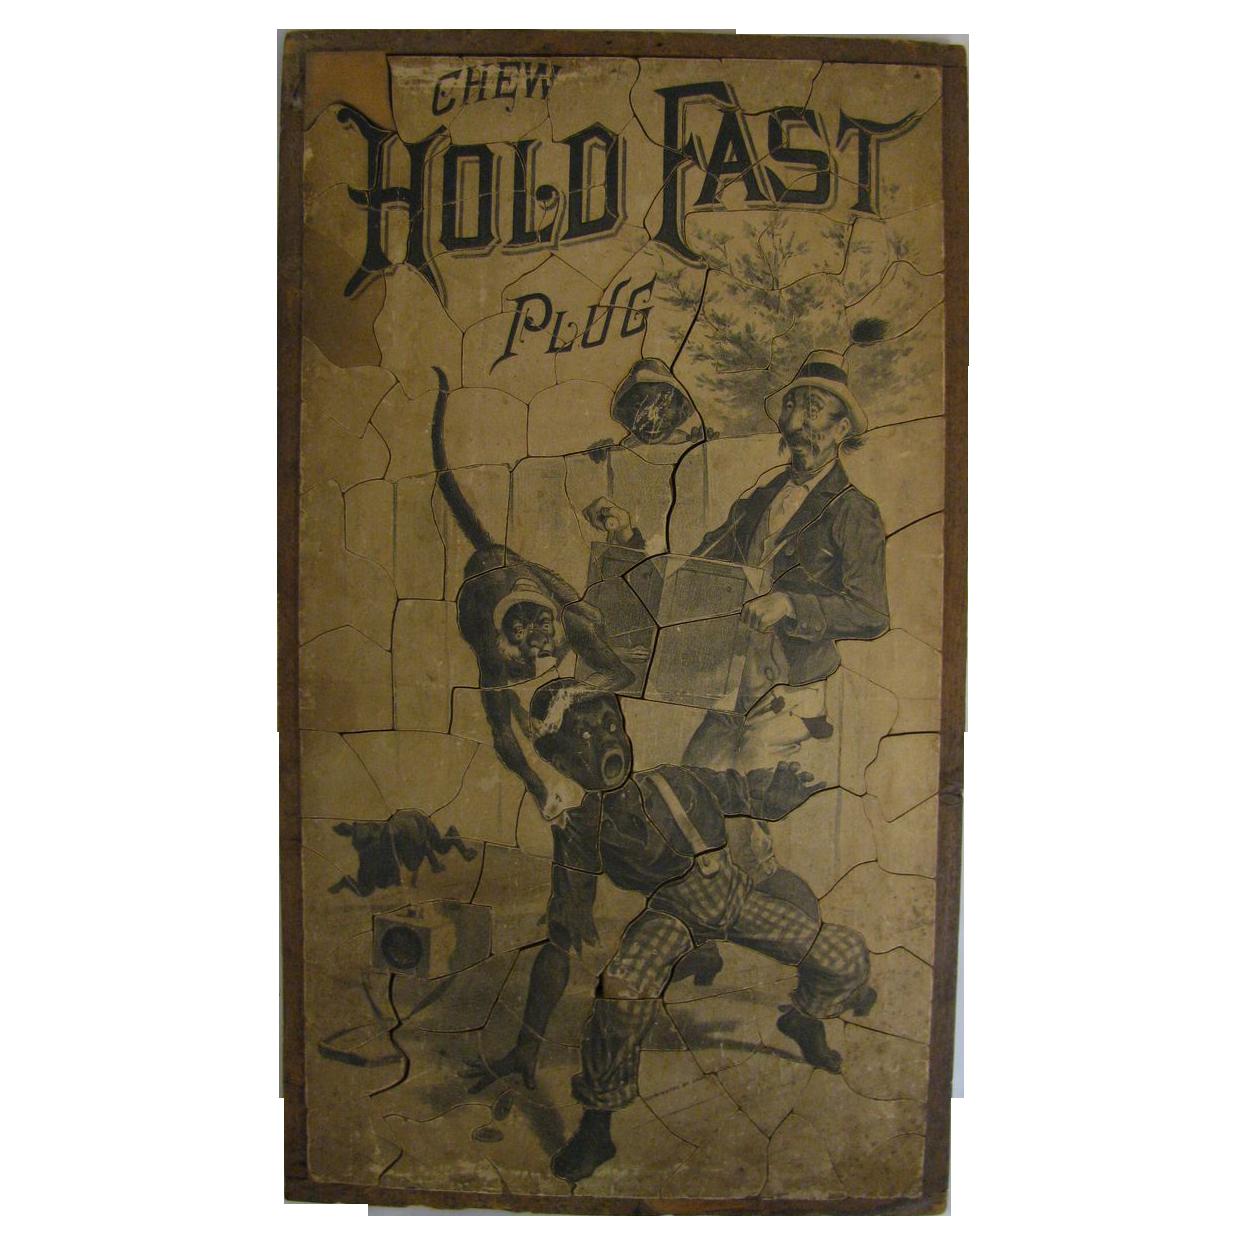 Antique Wooden Black Americana Tobacco Advertising Puzzle